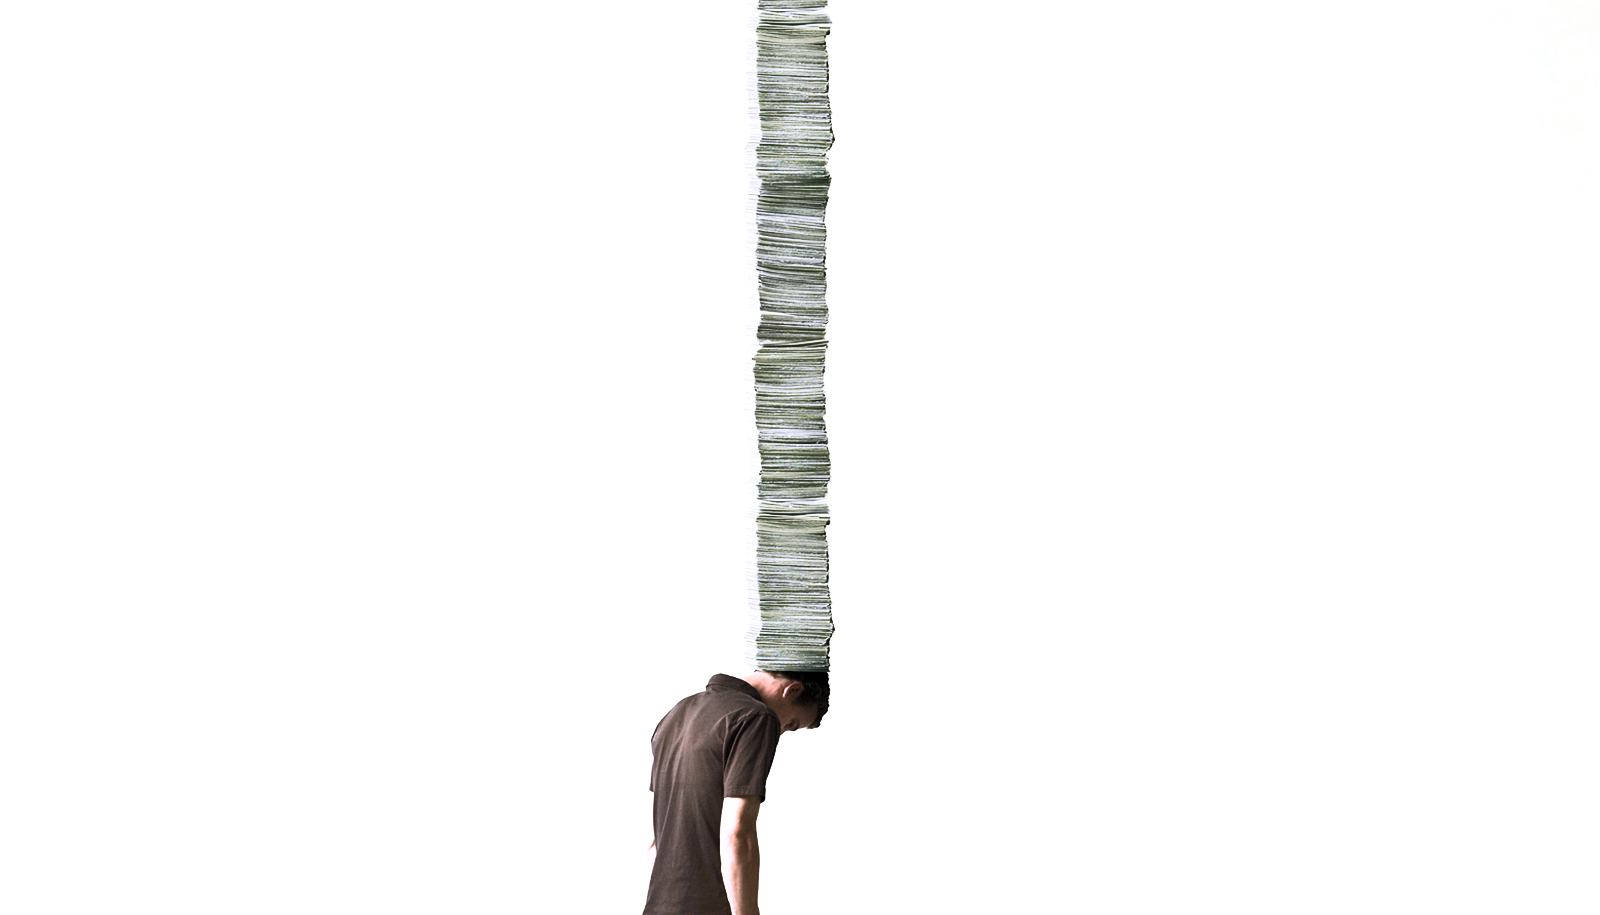 Americans owe at least $140 billion in medical debt